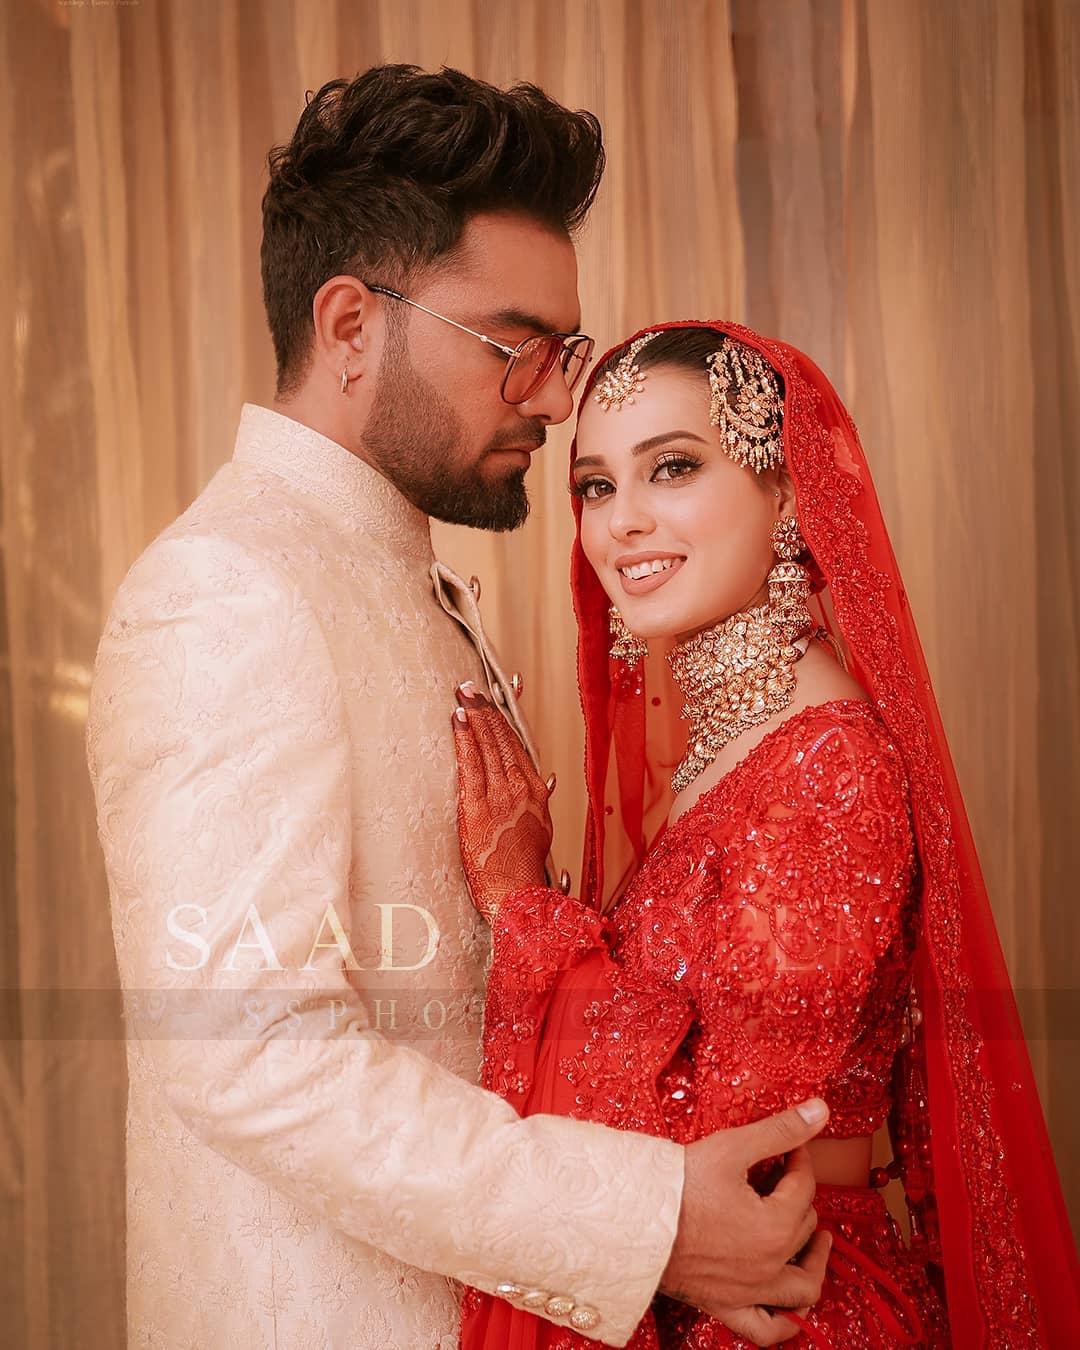 Iqra Aziz and Yasir Hussain Wedding Pictures (29)